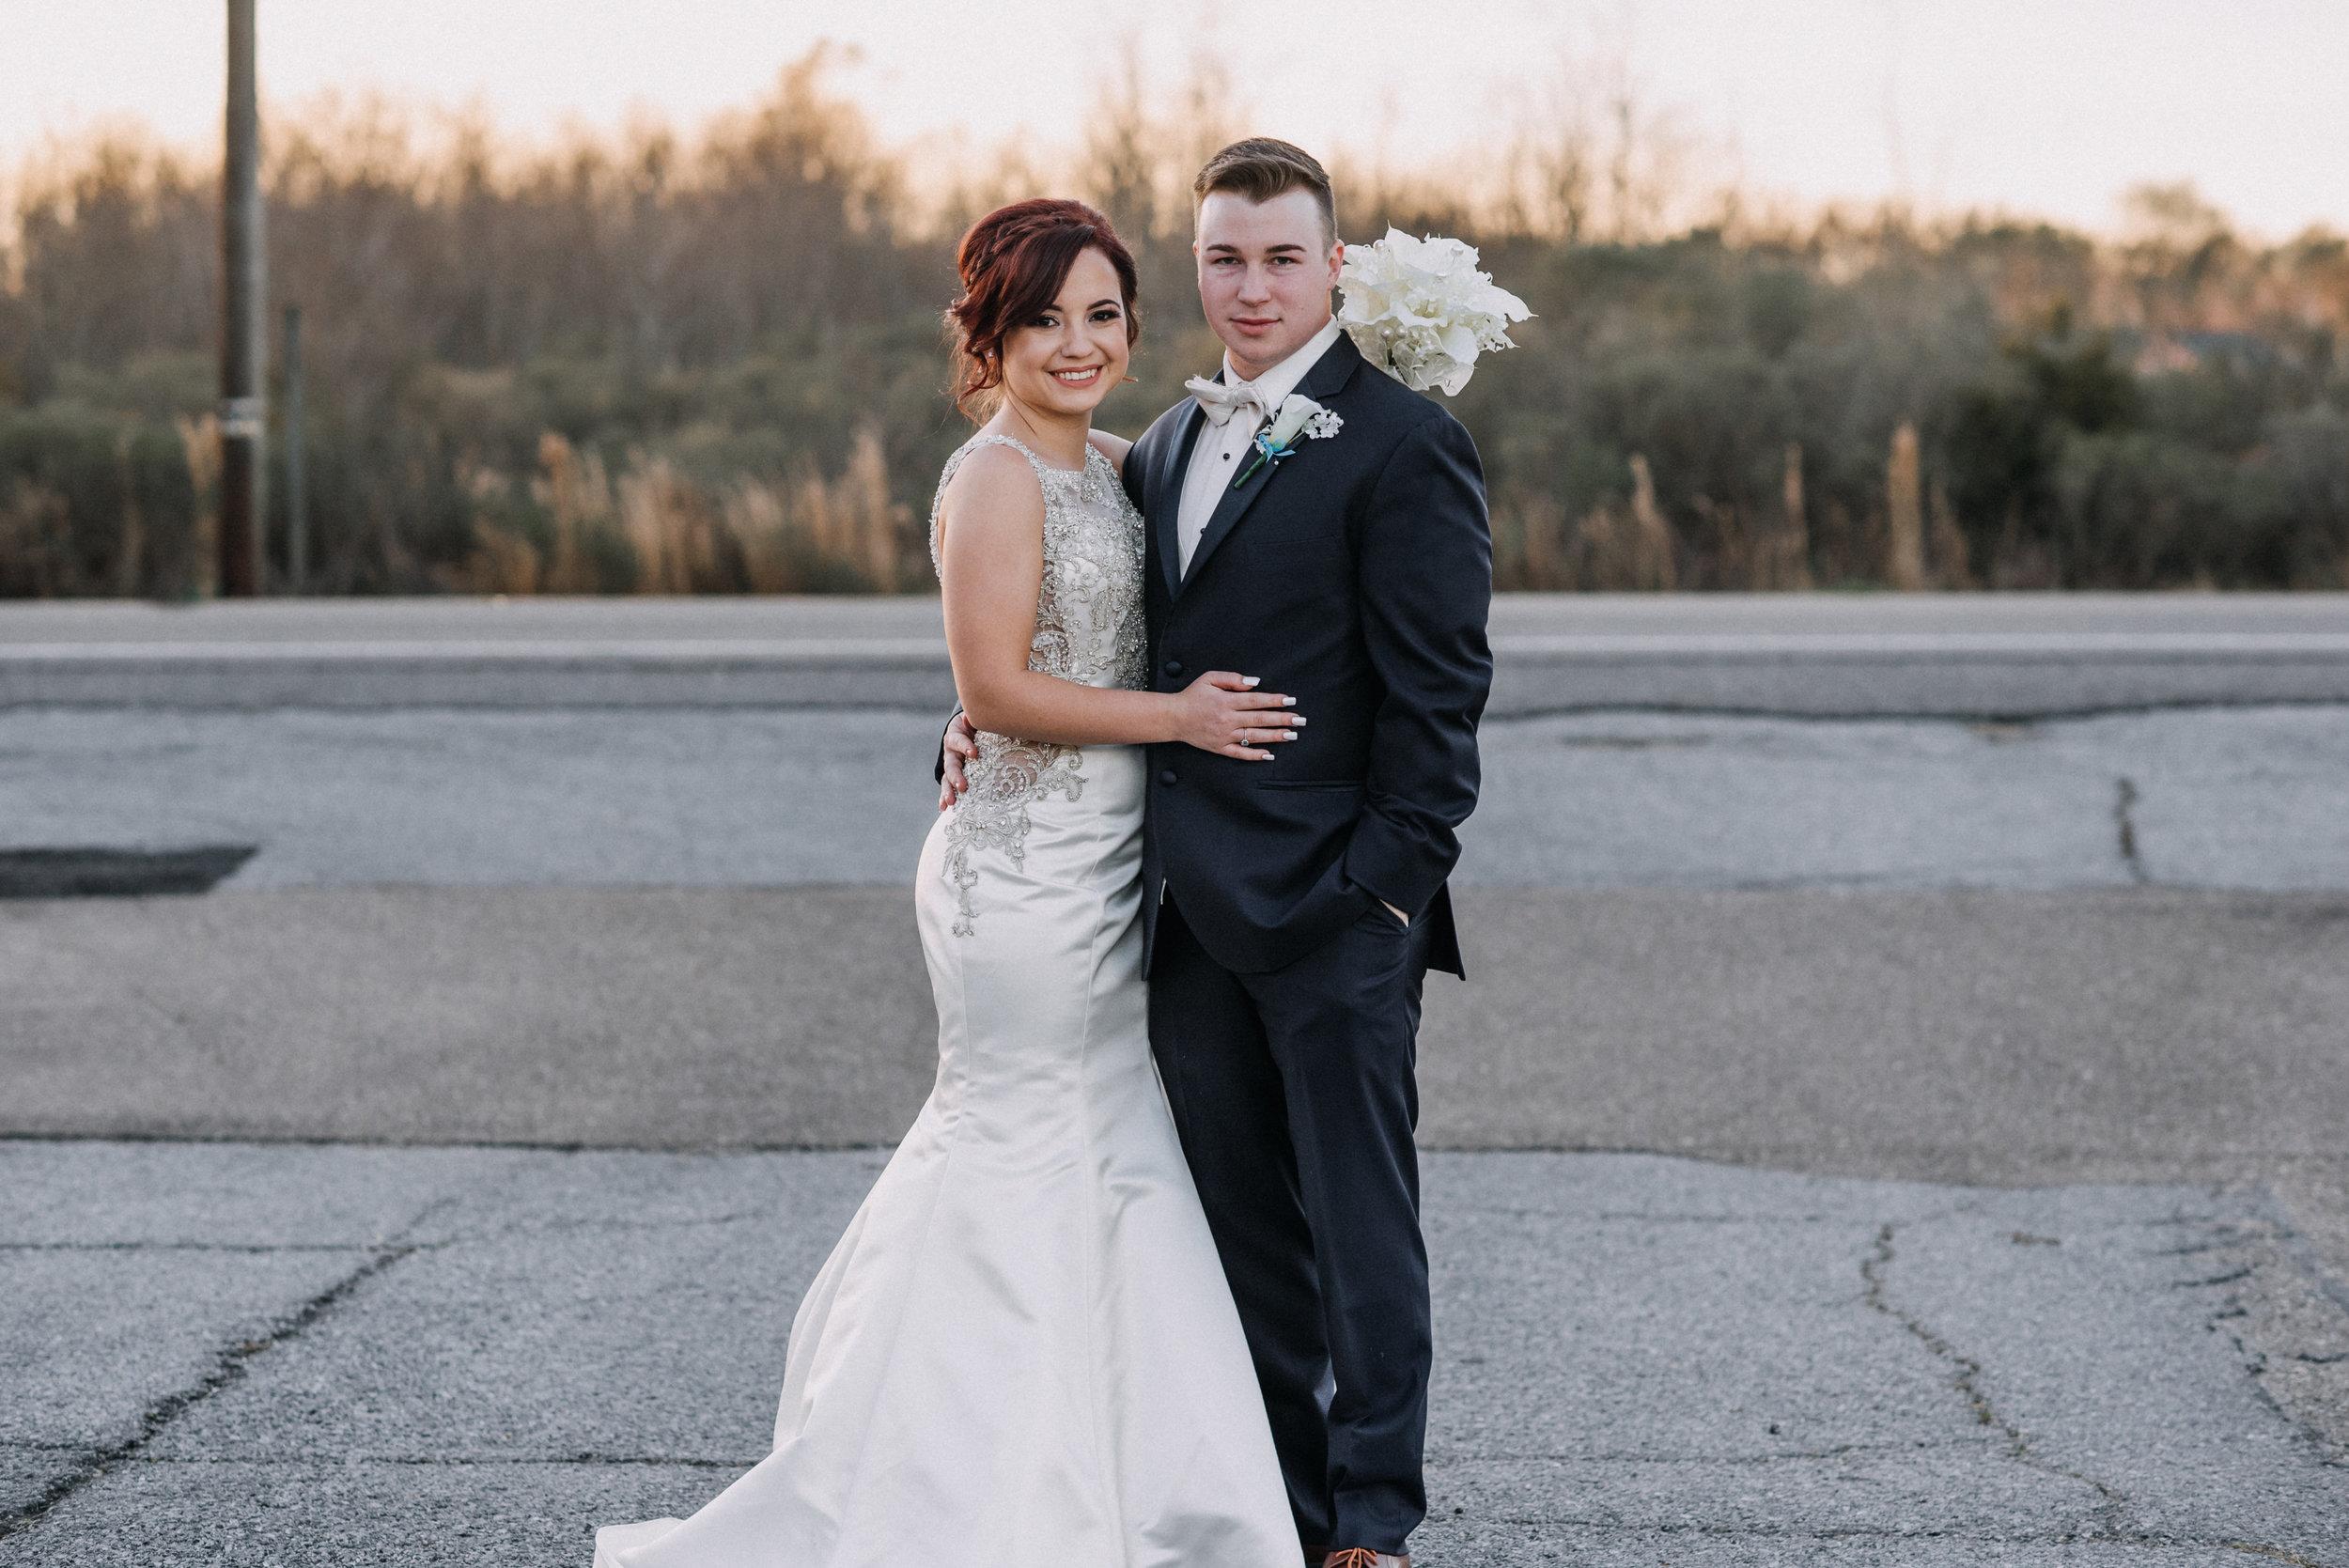 Wedding Photographer-St. Francisville LA